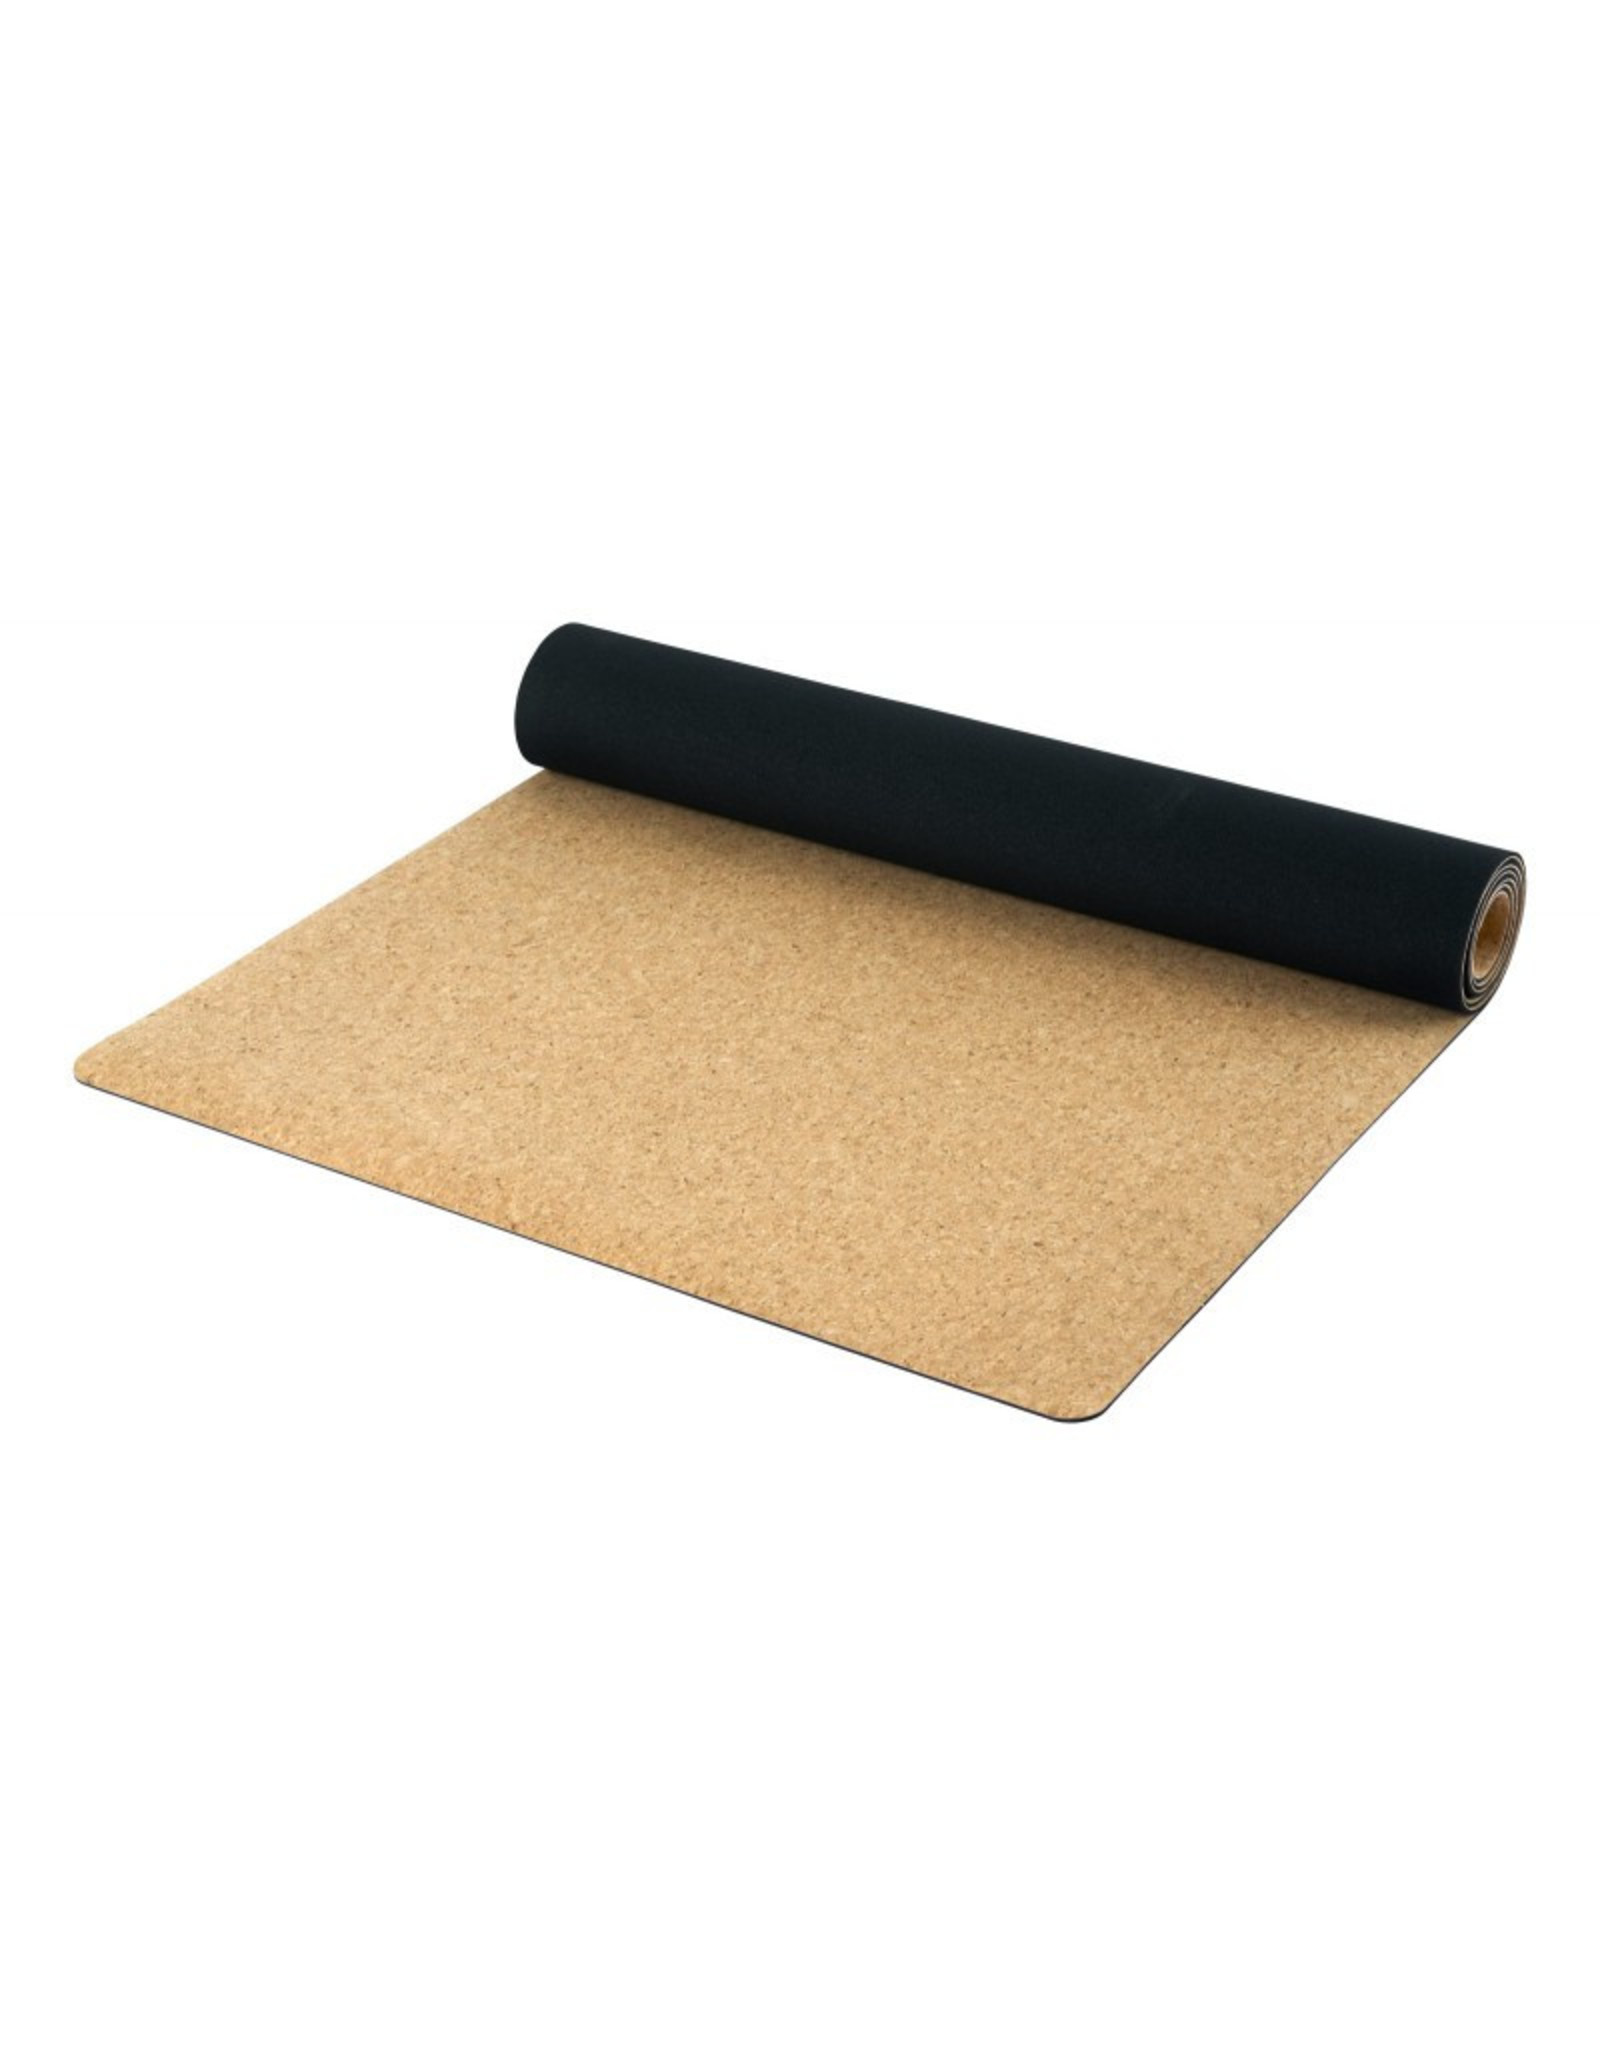 Mani Vivendi yogamat kurk en kurk rubber